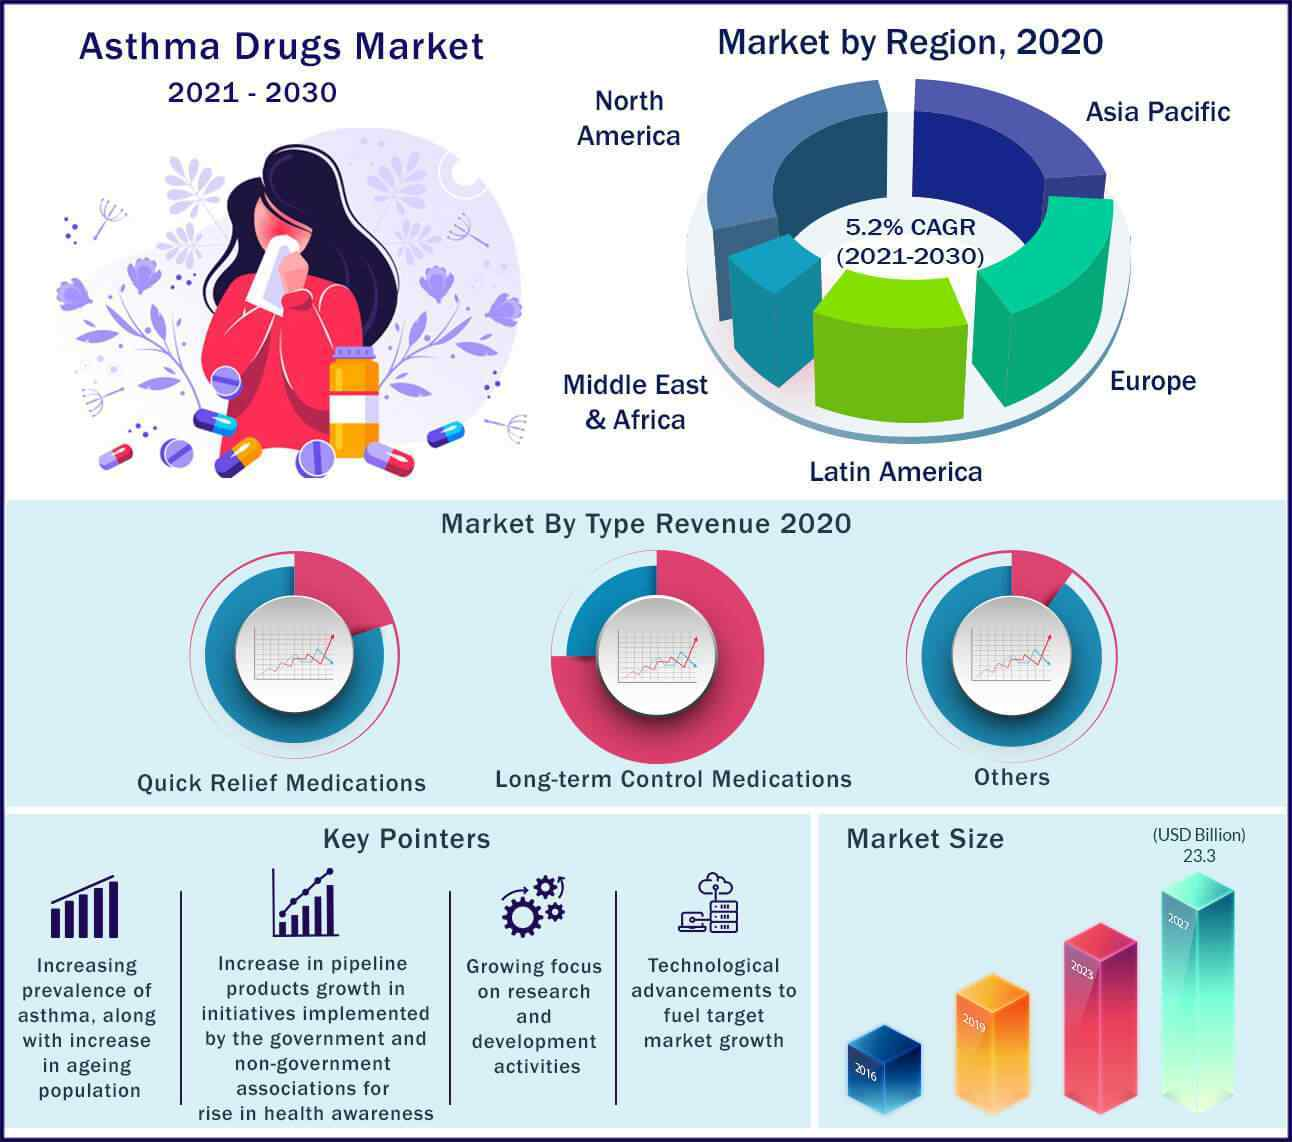 Global Asthma Drugs Market 2021-2030